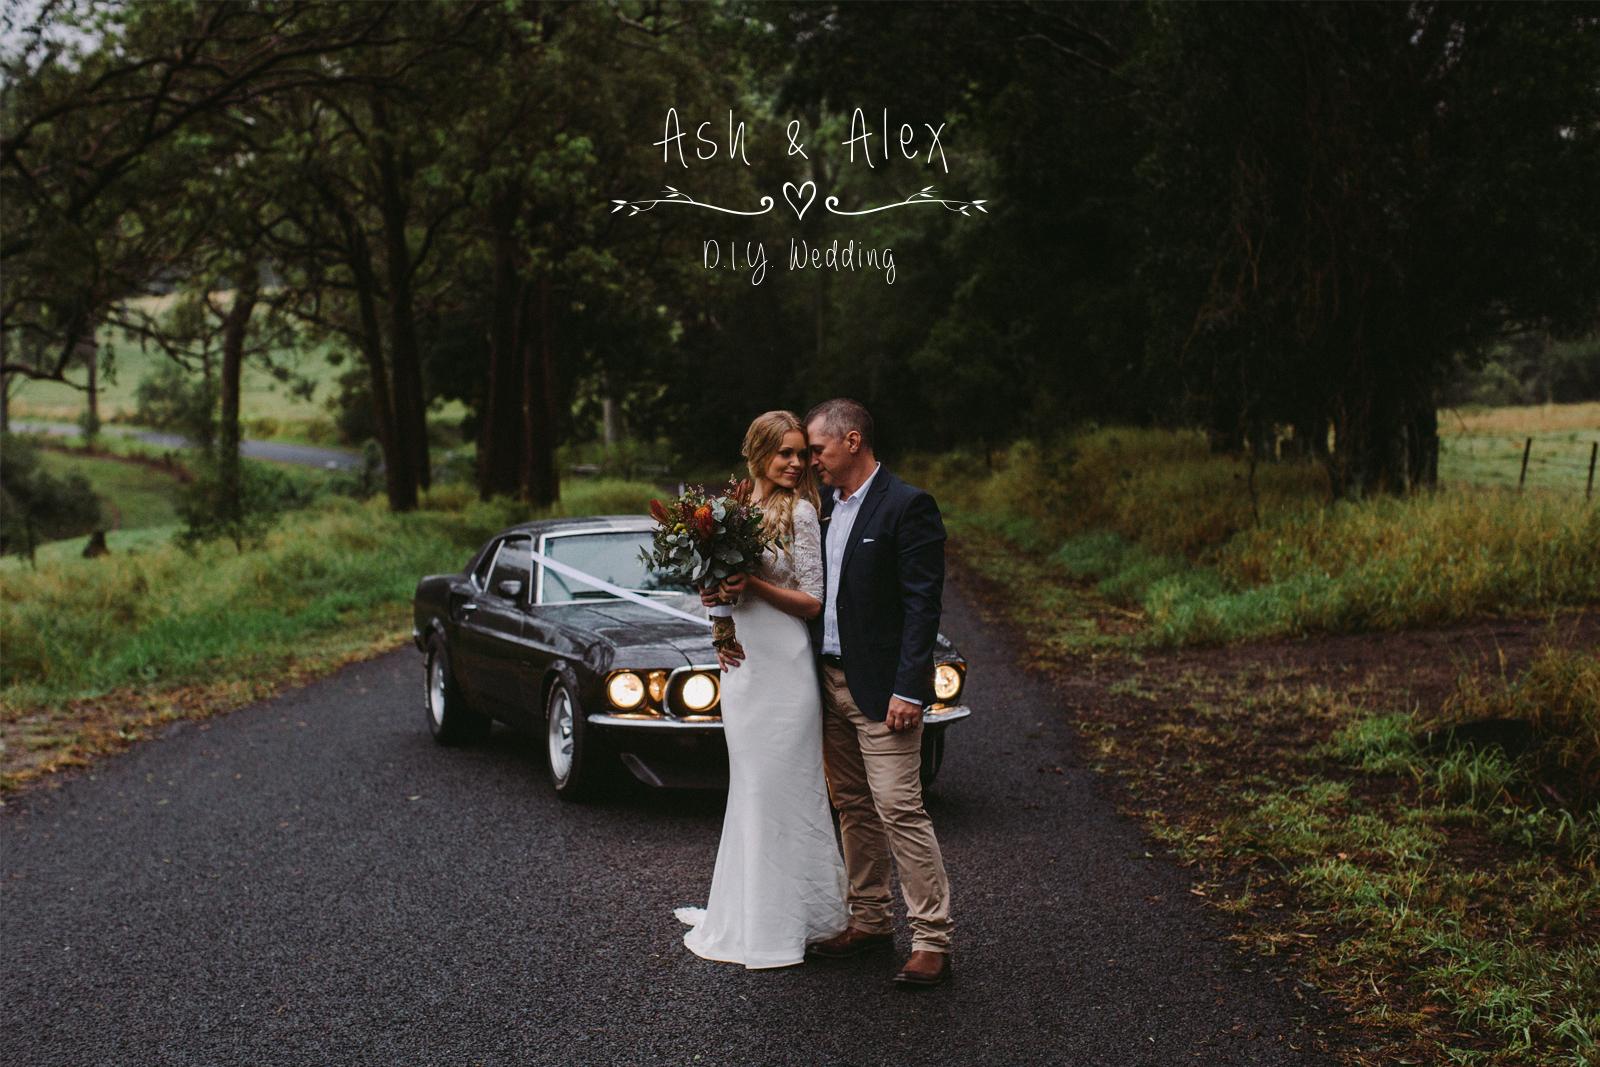 Ashley & Alex ~ Married in Mount Pleasant, Queensland